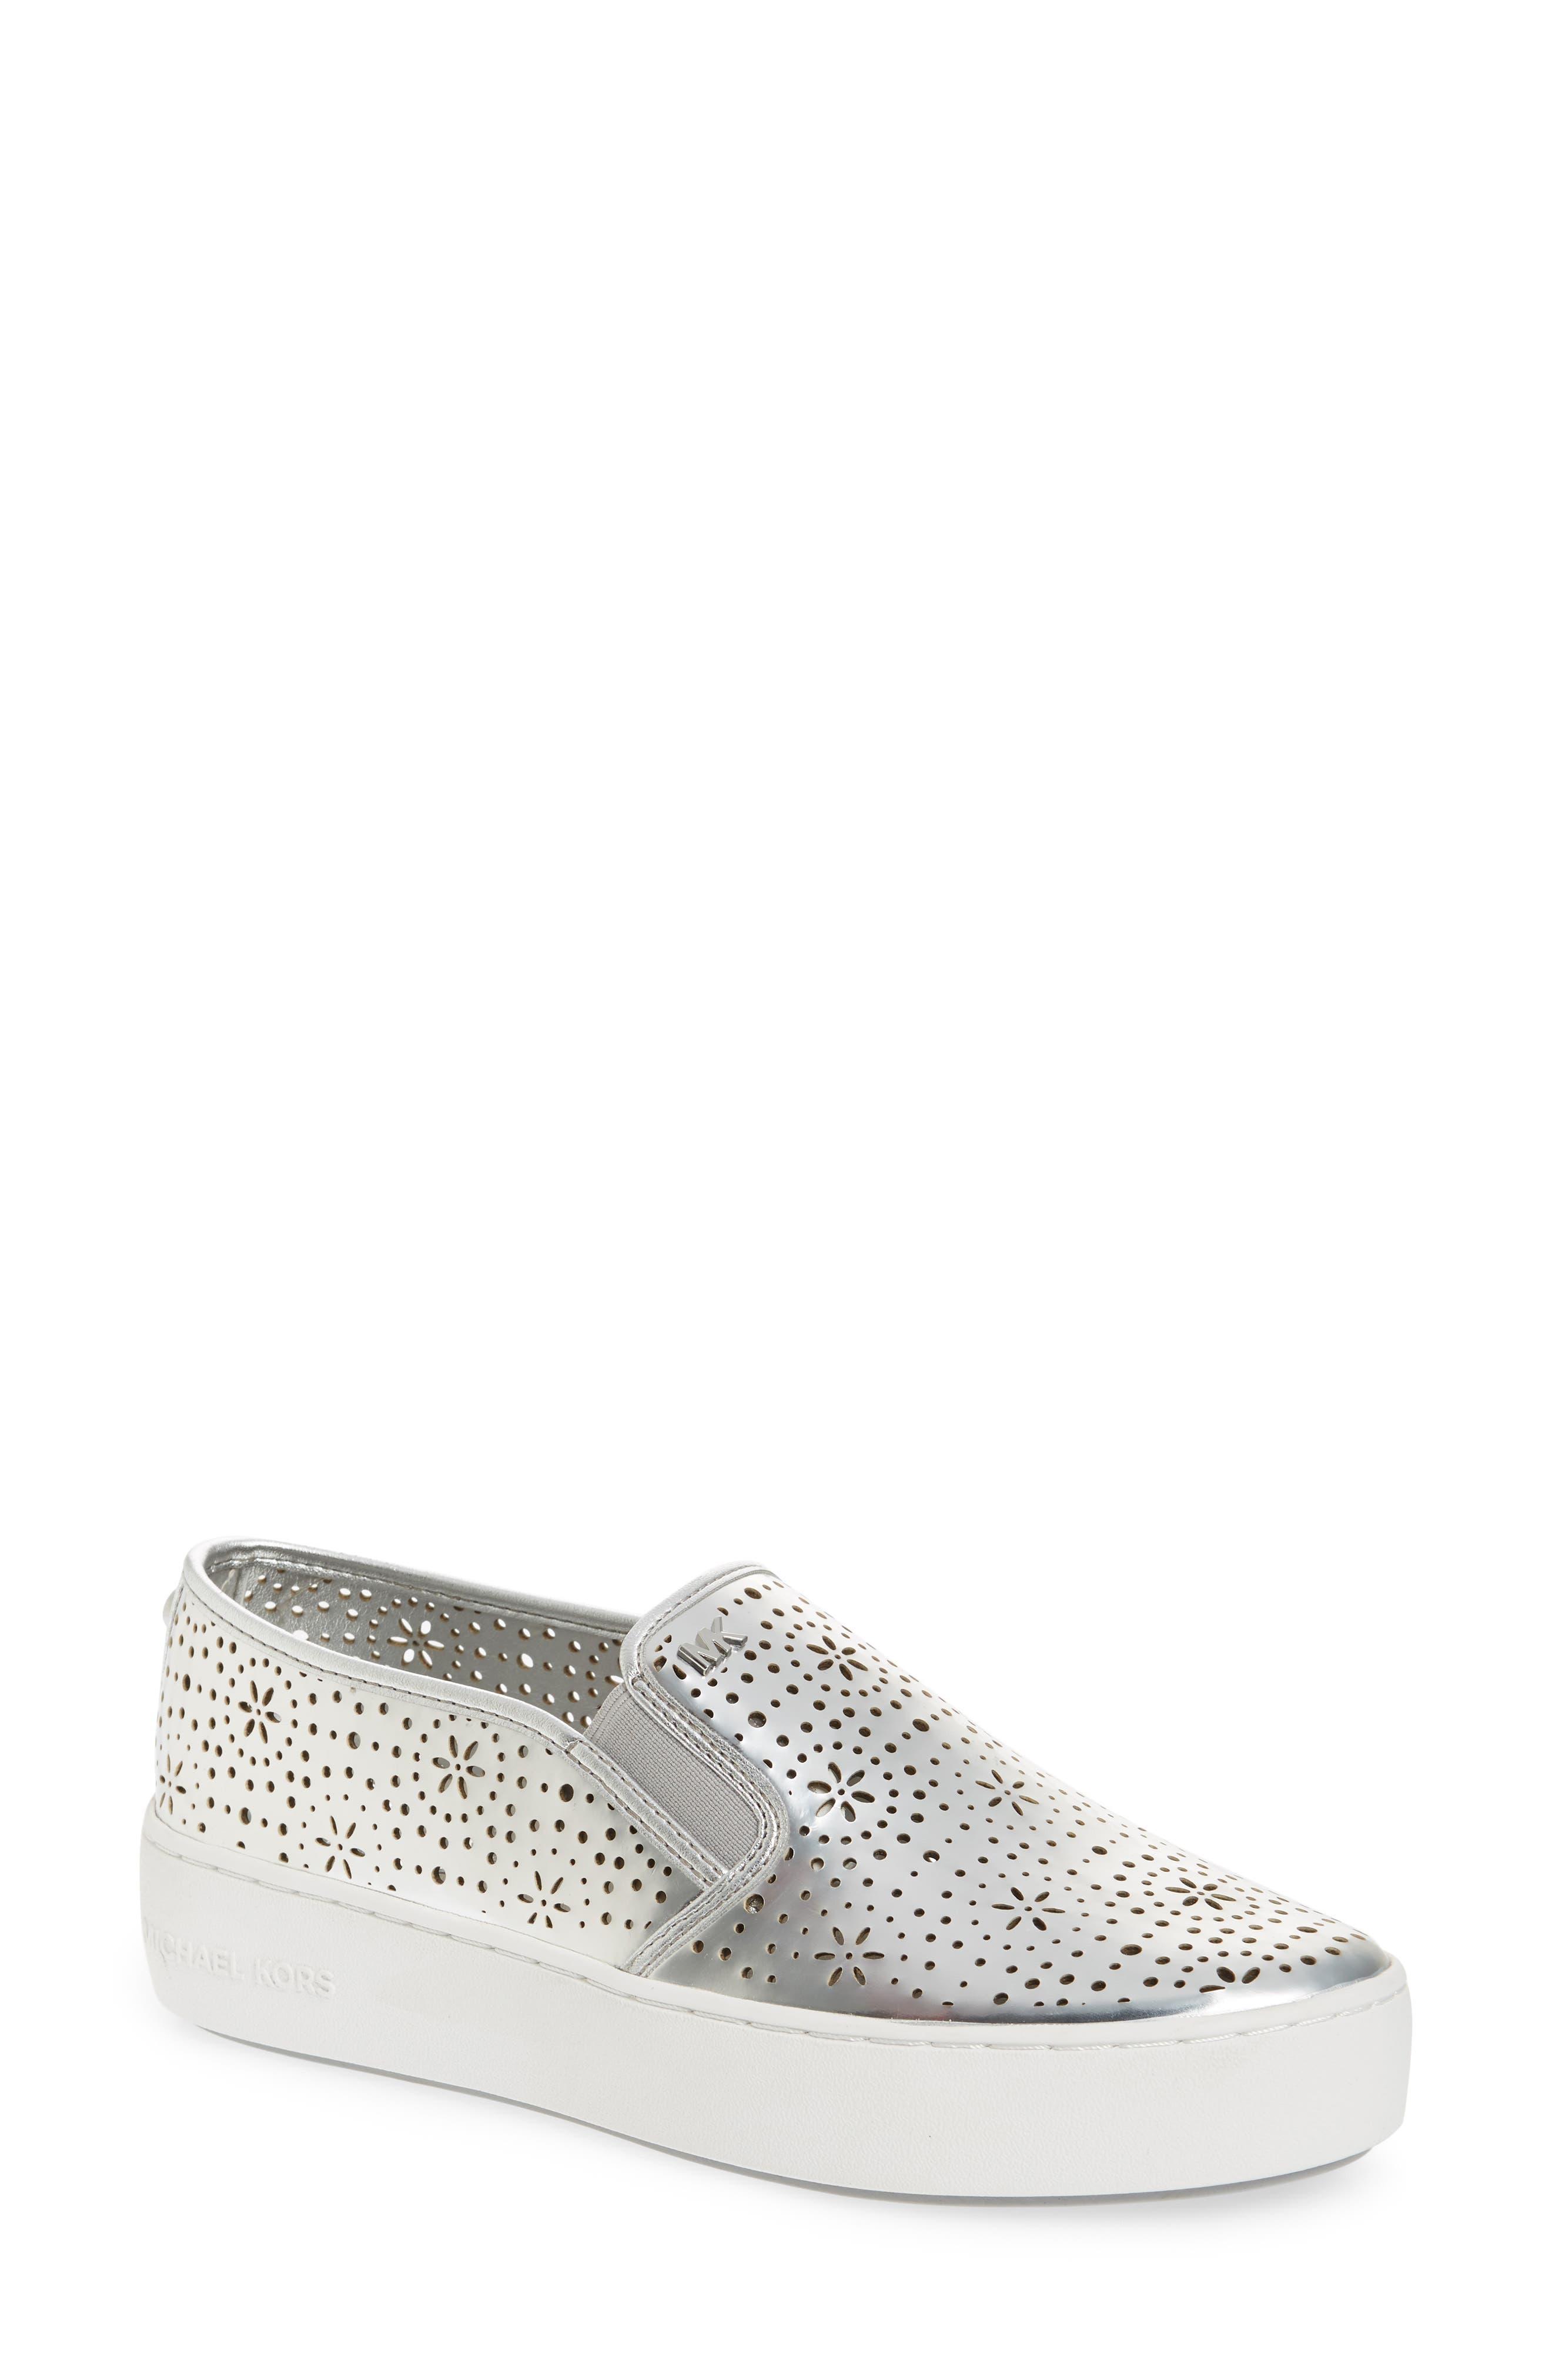 Trent Slip-On Sneaker,                         Main,                         color, Silver